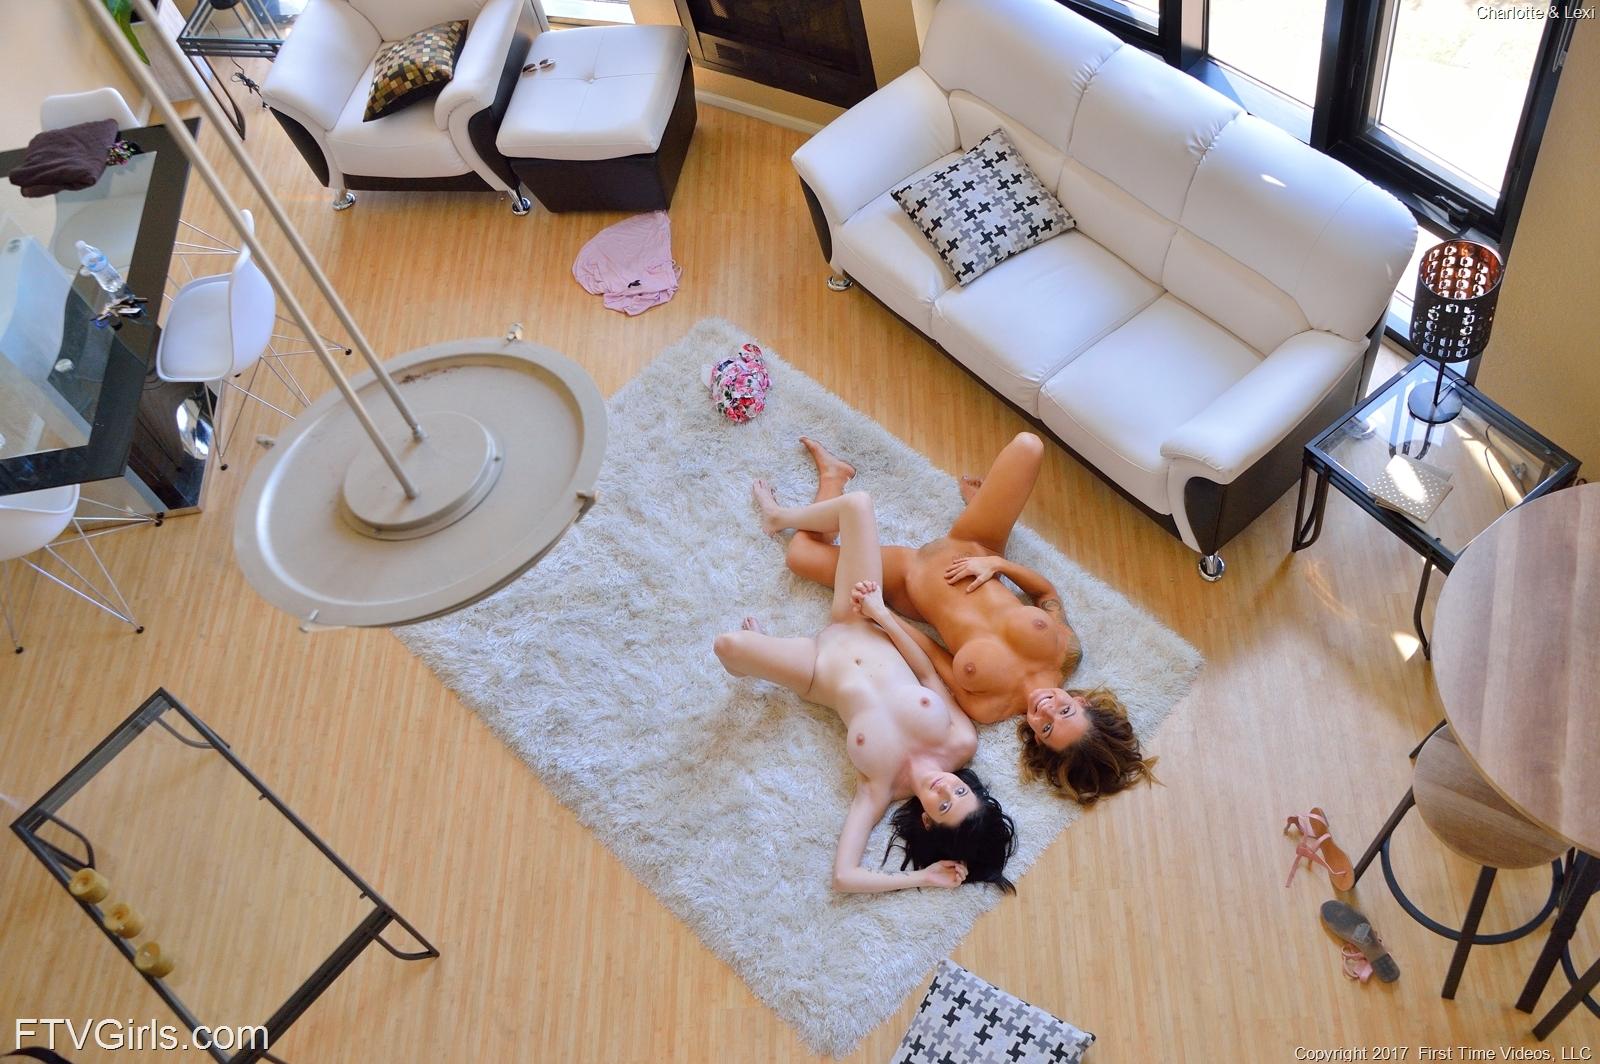 charlotte-lexi-veggie-interlude-lesbian-nude-boobs-ftvgirls-42